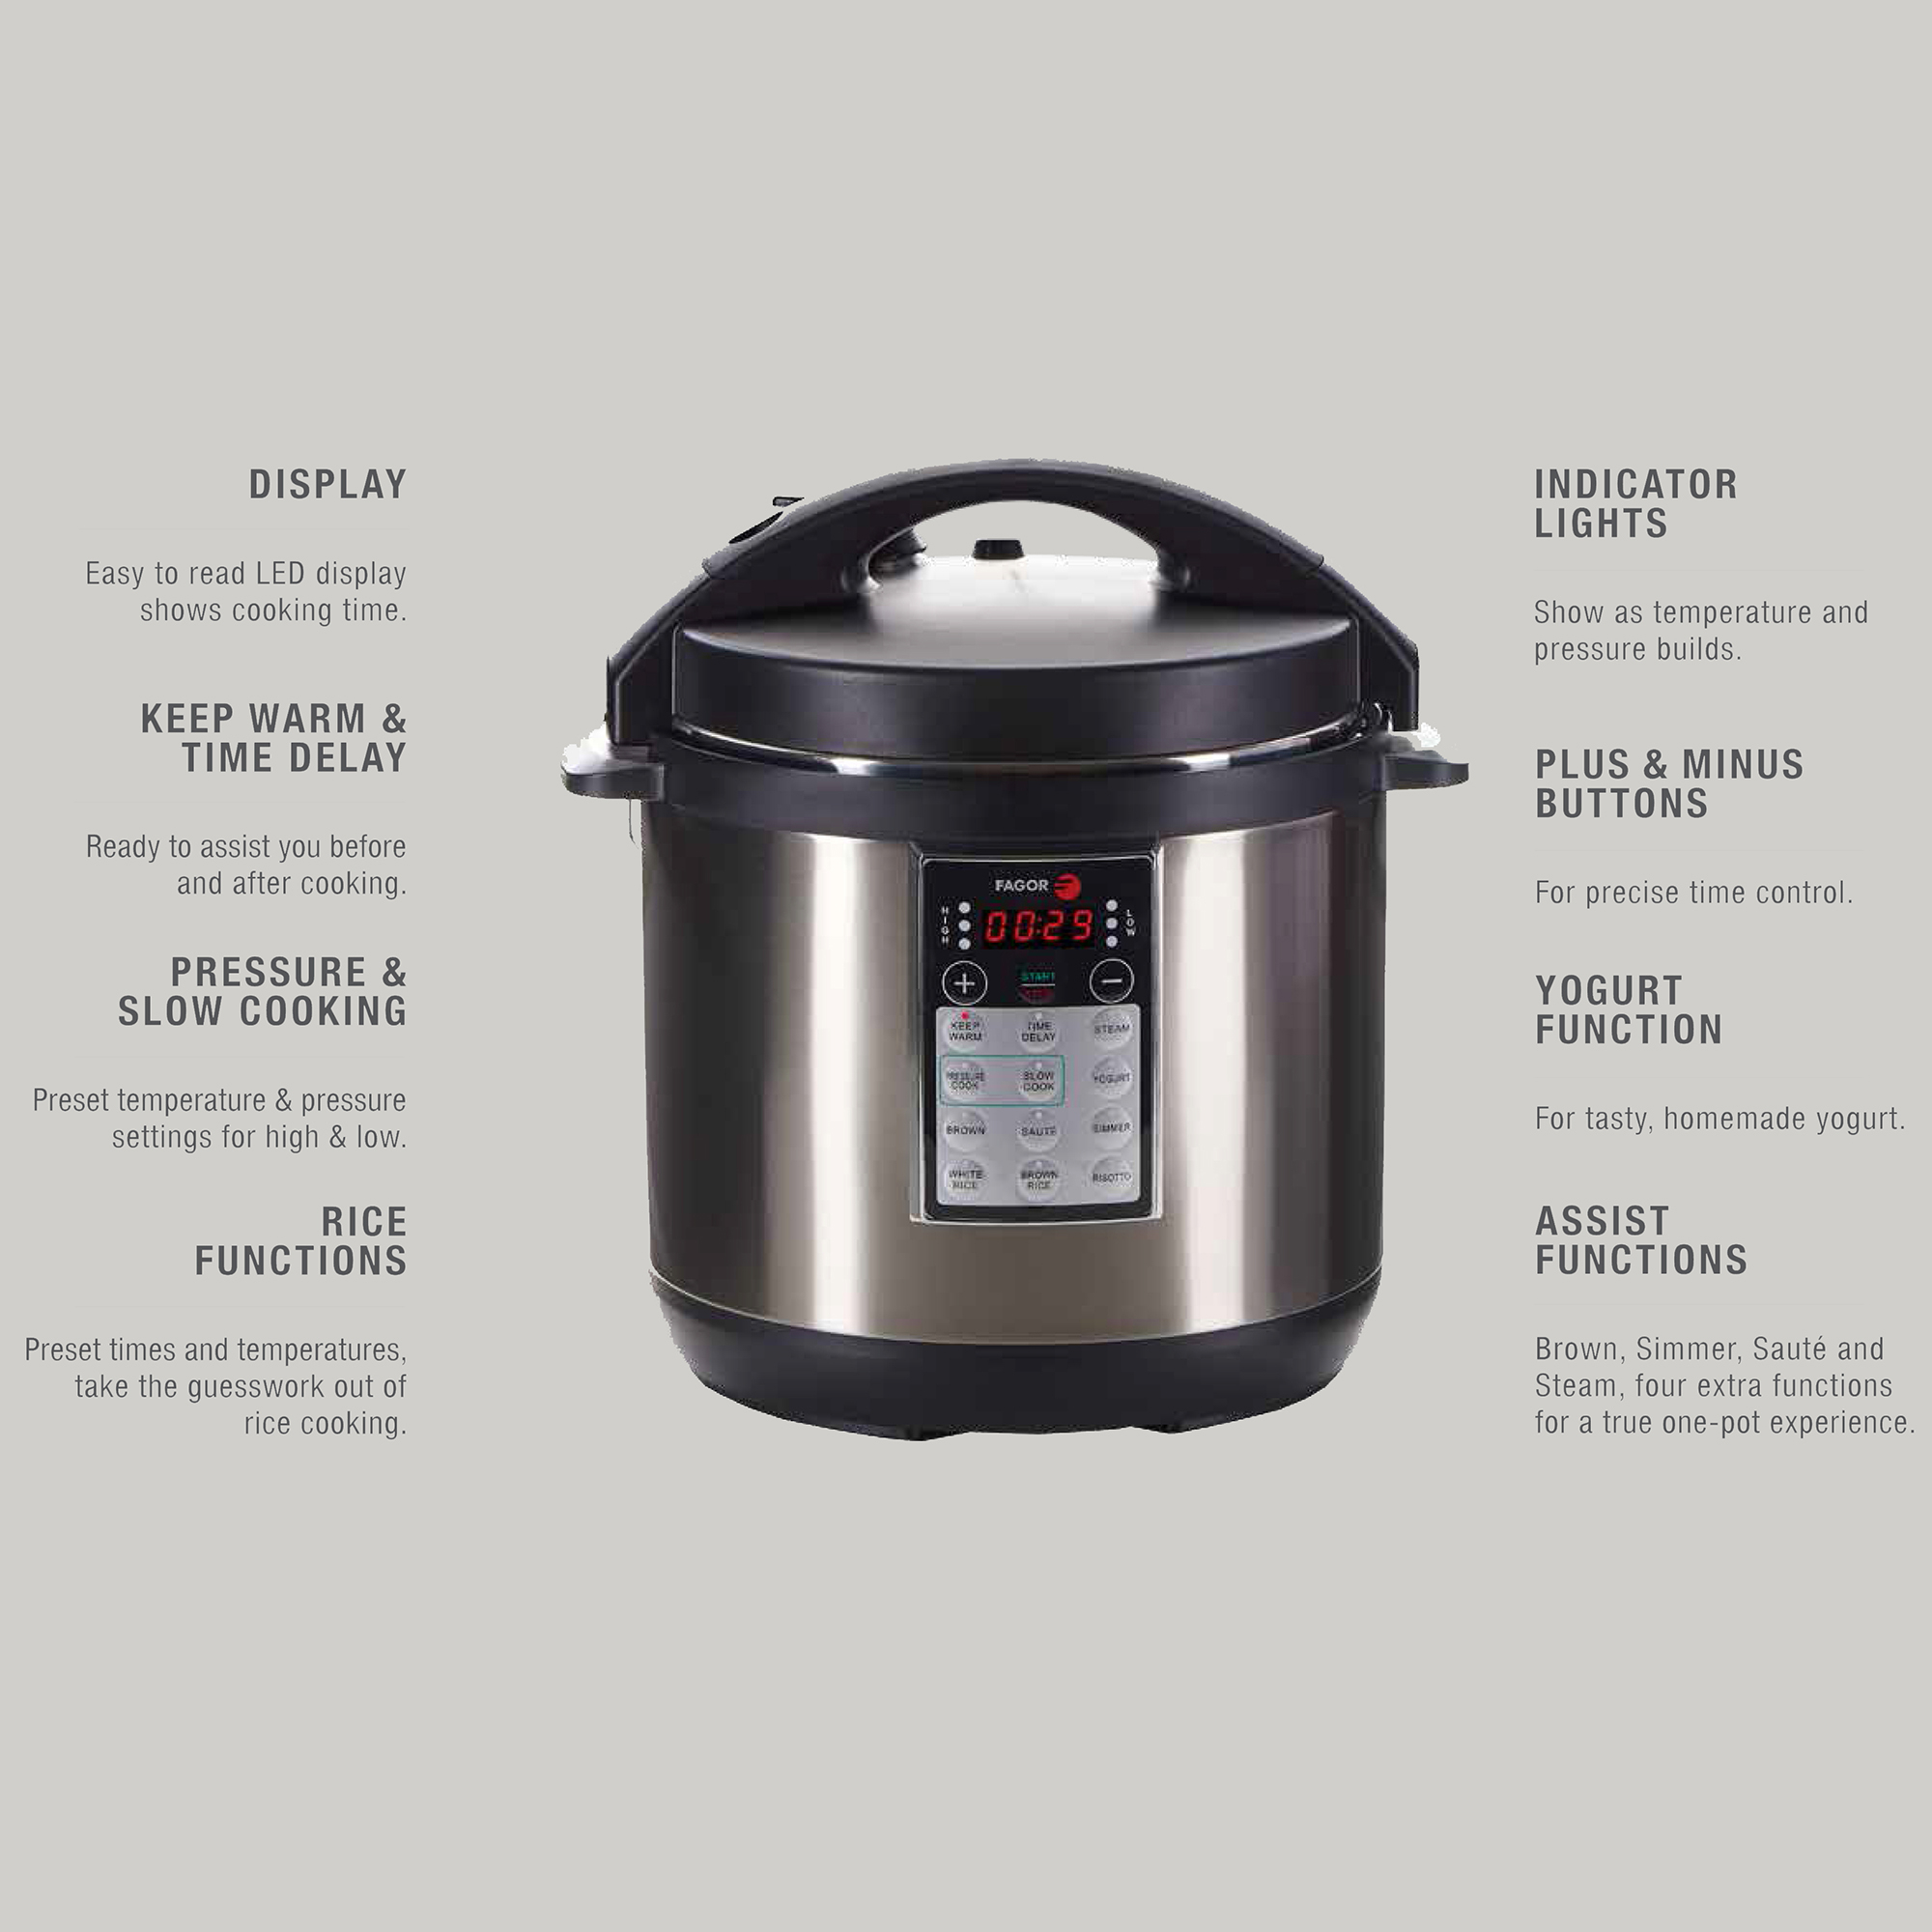 Fagor LUX™ Electric 4 Quart Multi Cooker